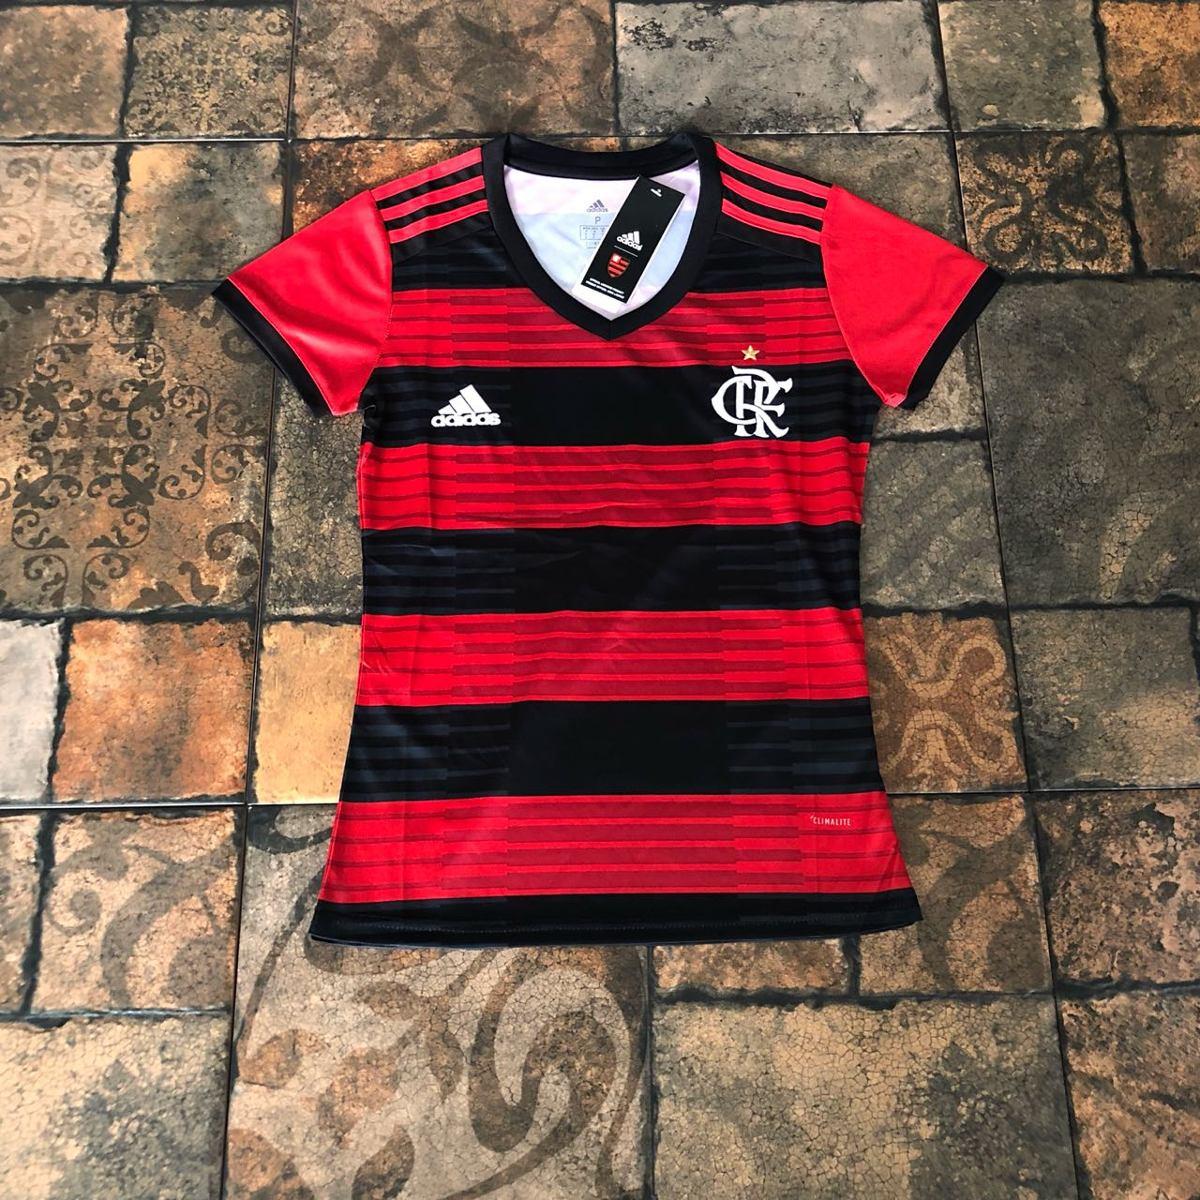 5a4c040074 Características. Marca flamengo  Time Flamengo  Tipo de camisa feminina ...